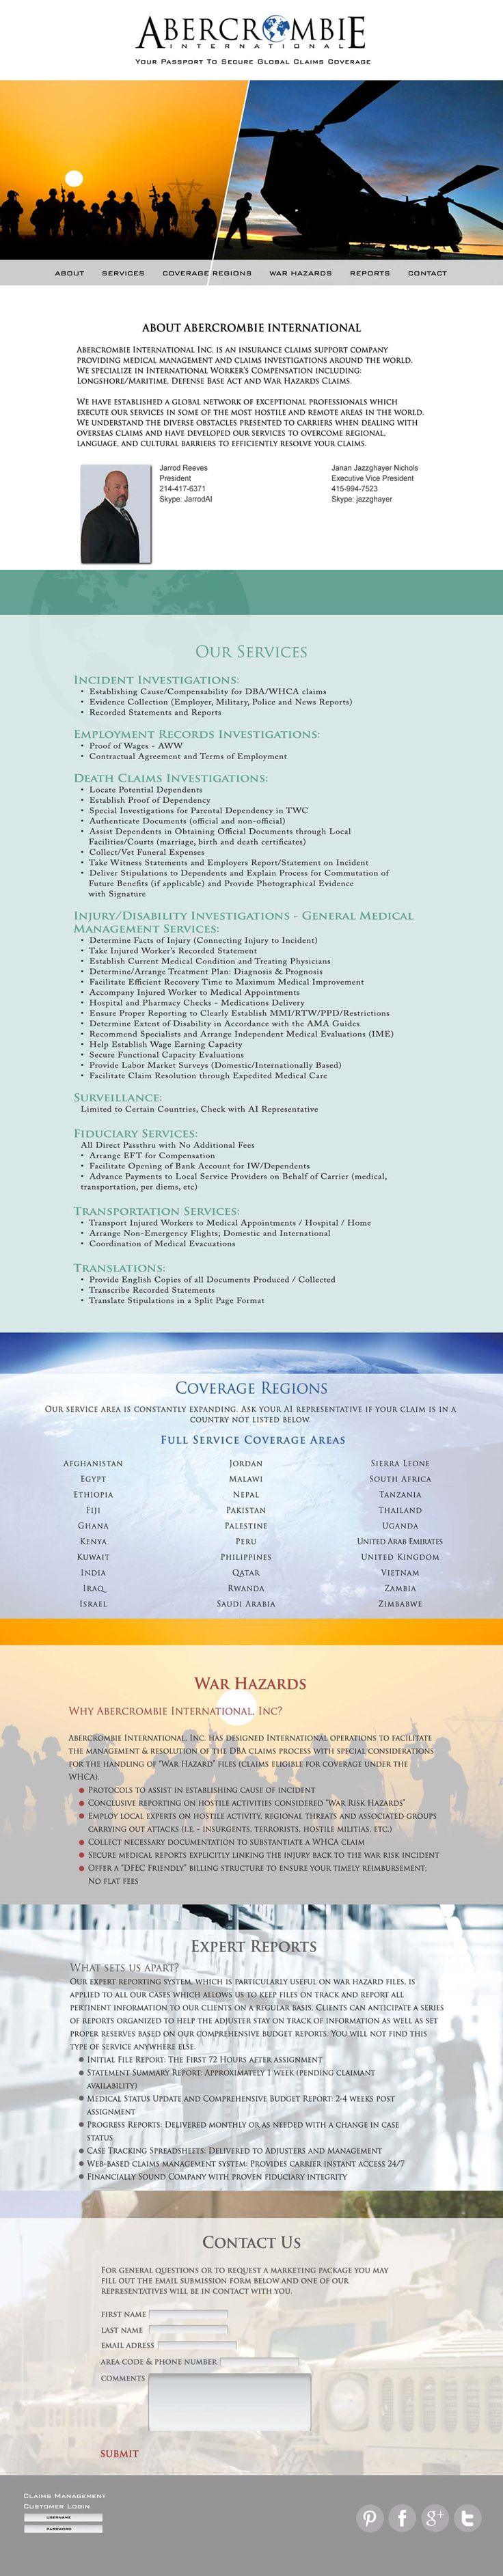 Abercrombie International - International Insurance Brokers